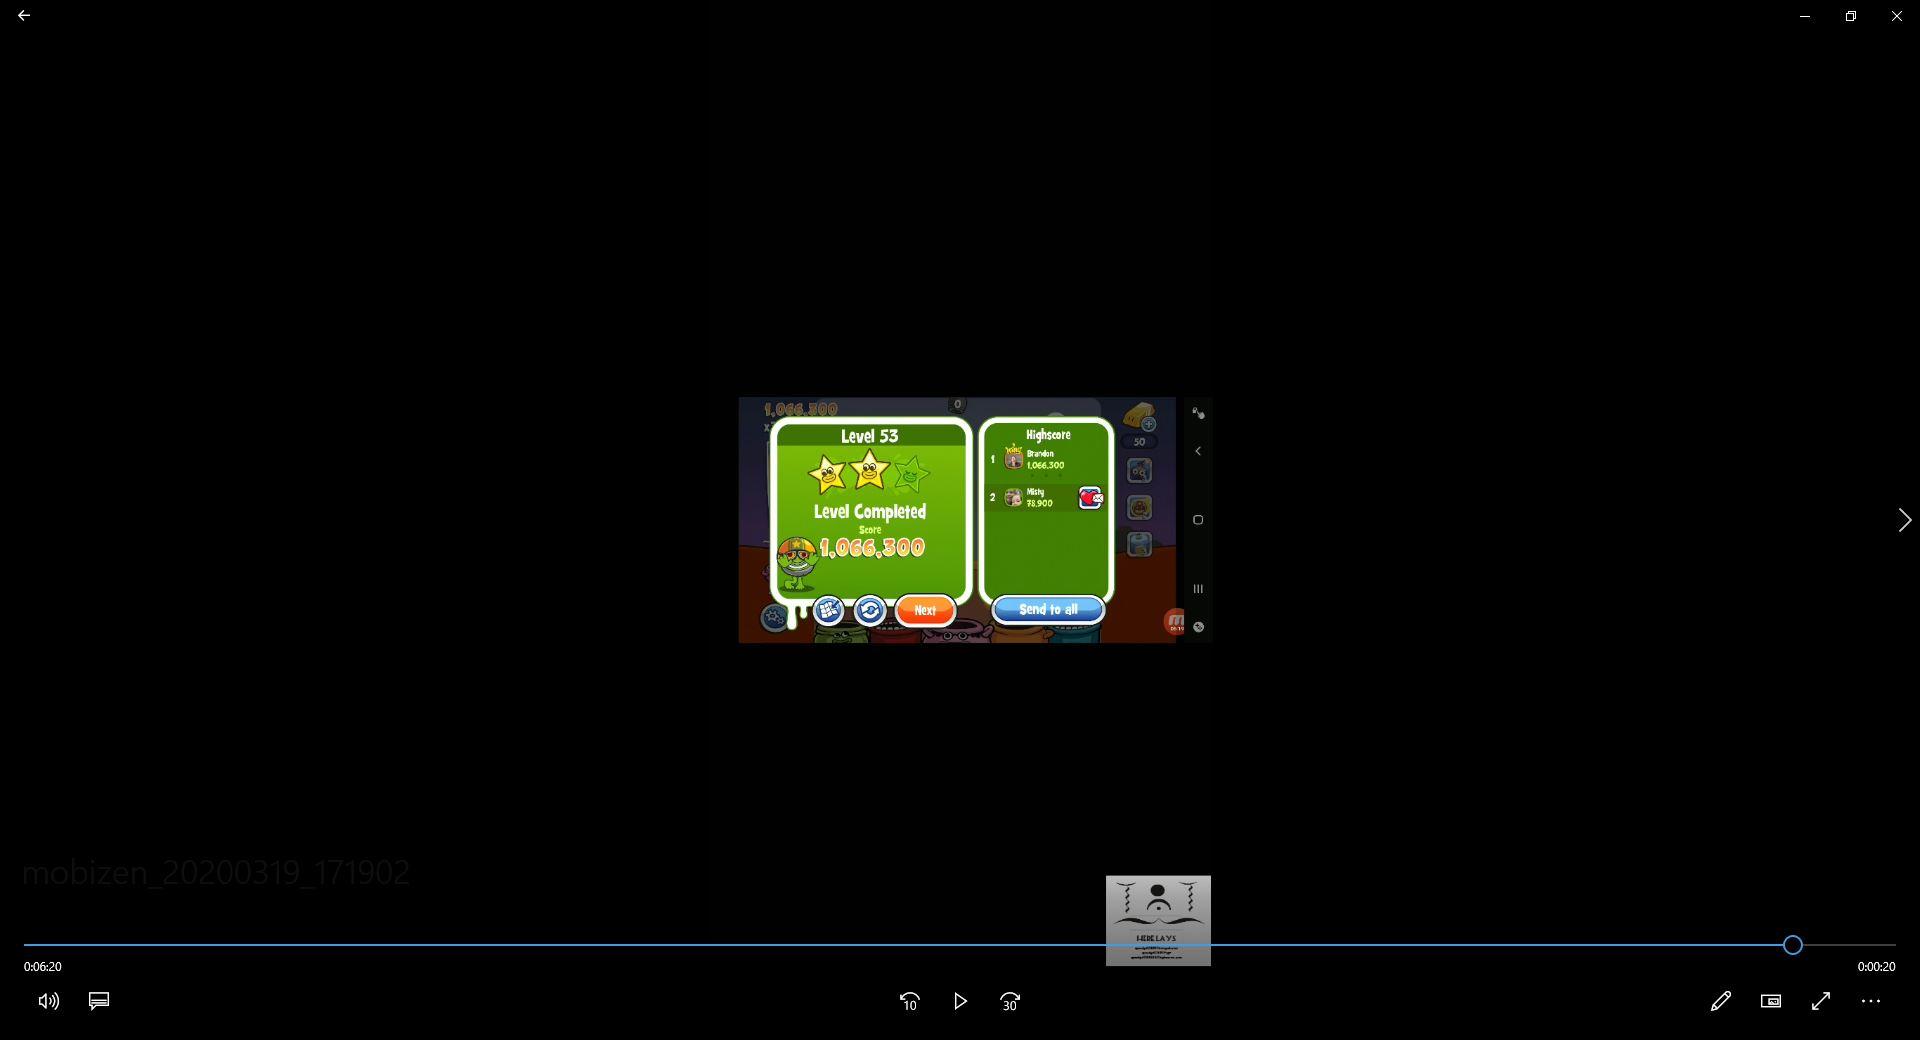 speedy4759123: Papa Pear Saga: Level 053 (Android) 1,066,300 points on 2020-03-29 13:06:44